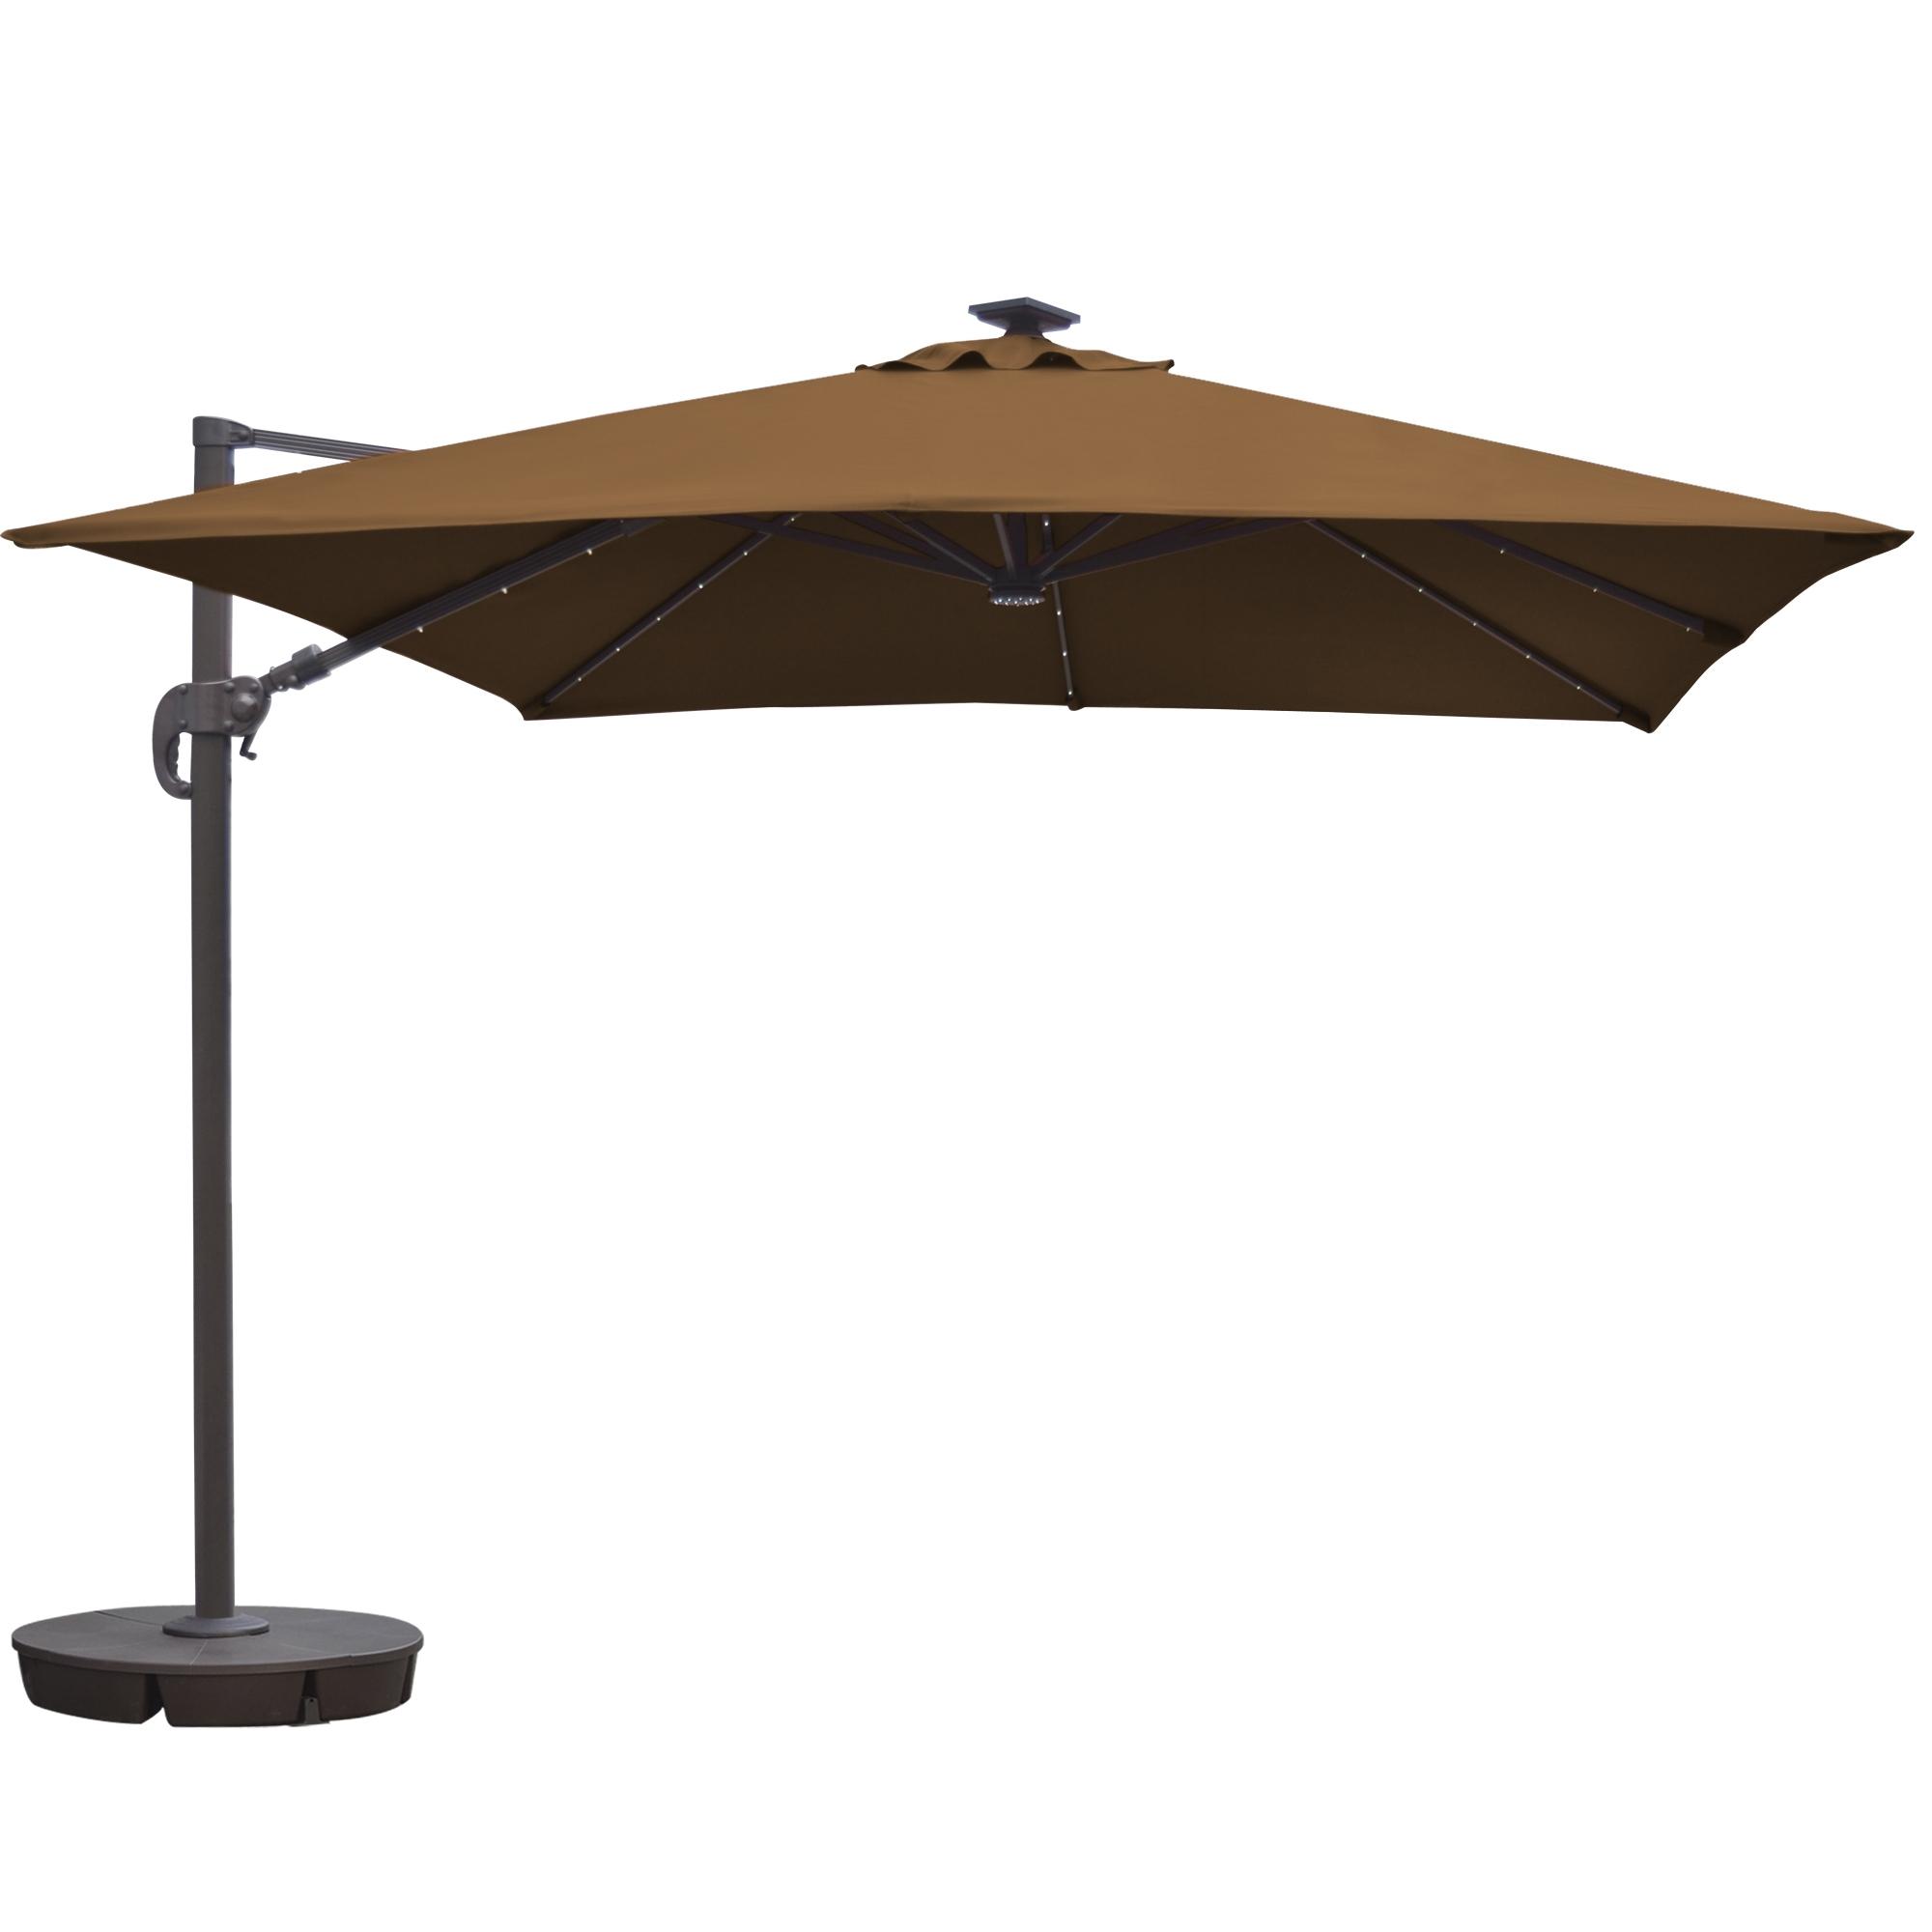 Island Umbrella Santorini Ii Fiesta 10 Ft Square Cantilever Solar Throughout 2018 Square Cantilever Patio Umbrellas (View 12 of 20)